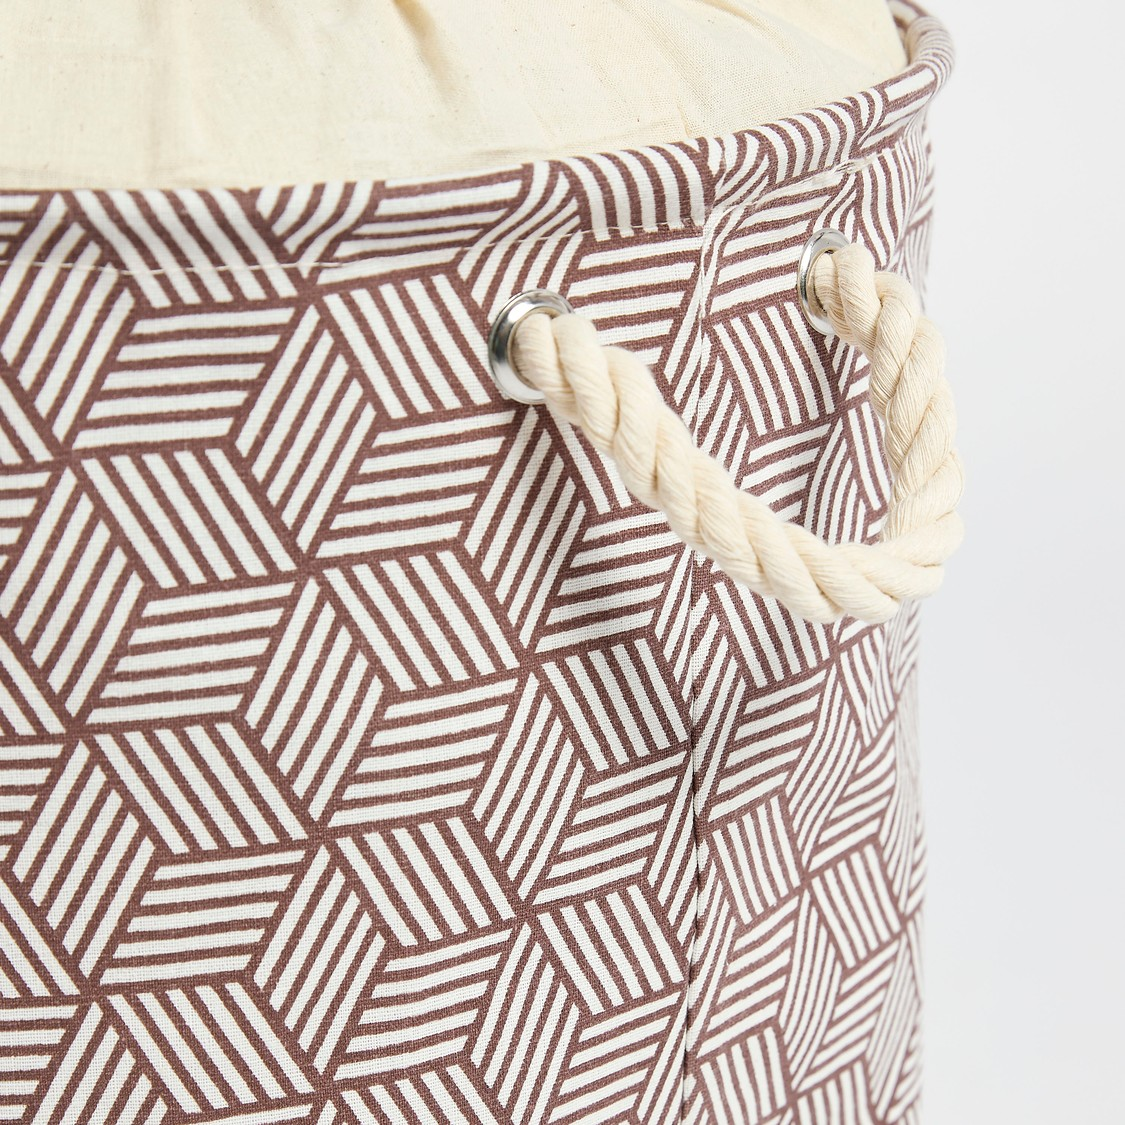 Geometric Print Laundry Hamper with Drawstring Closure - 49x38 cms